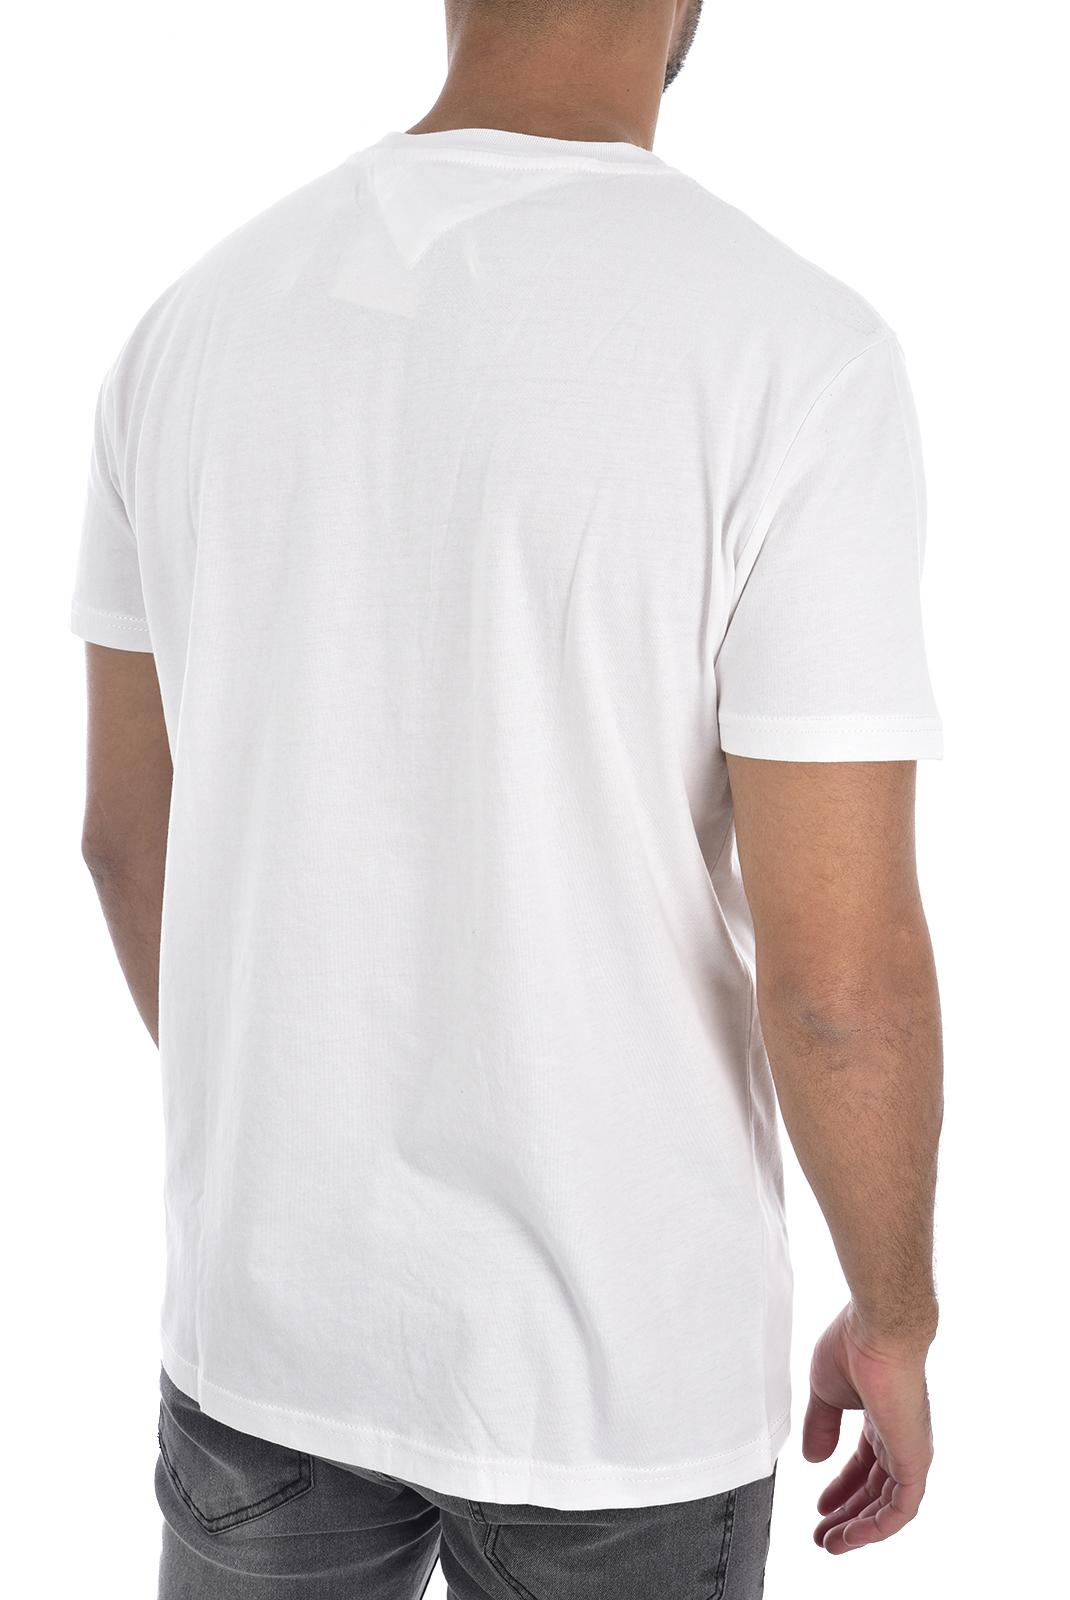 T-S manches courtes  Tommy Jeans DM0DM07537 YA2 CLASSIC WHITE